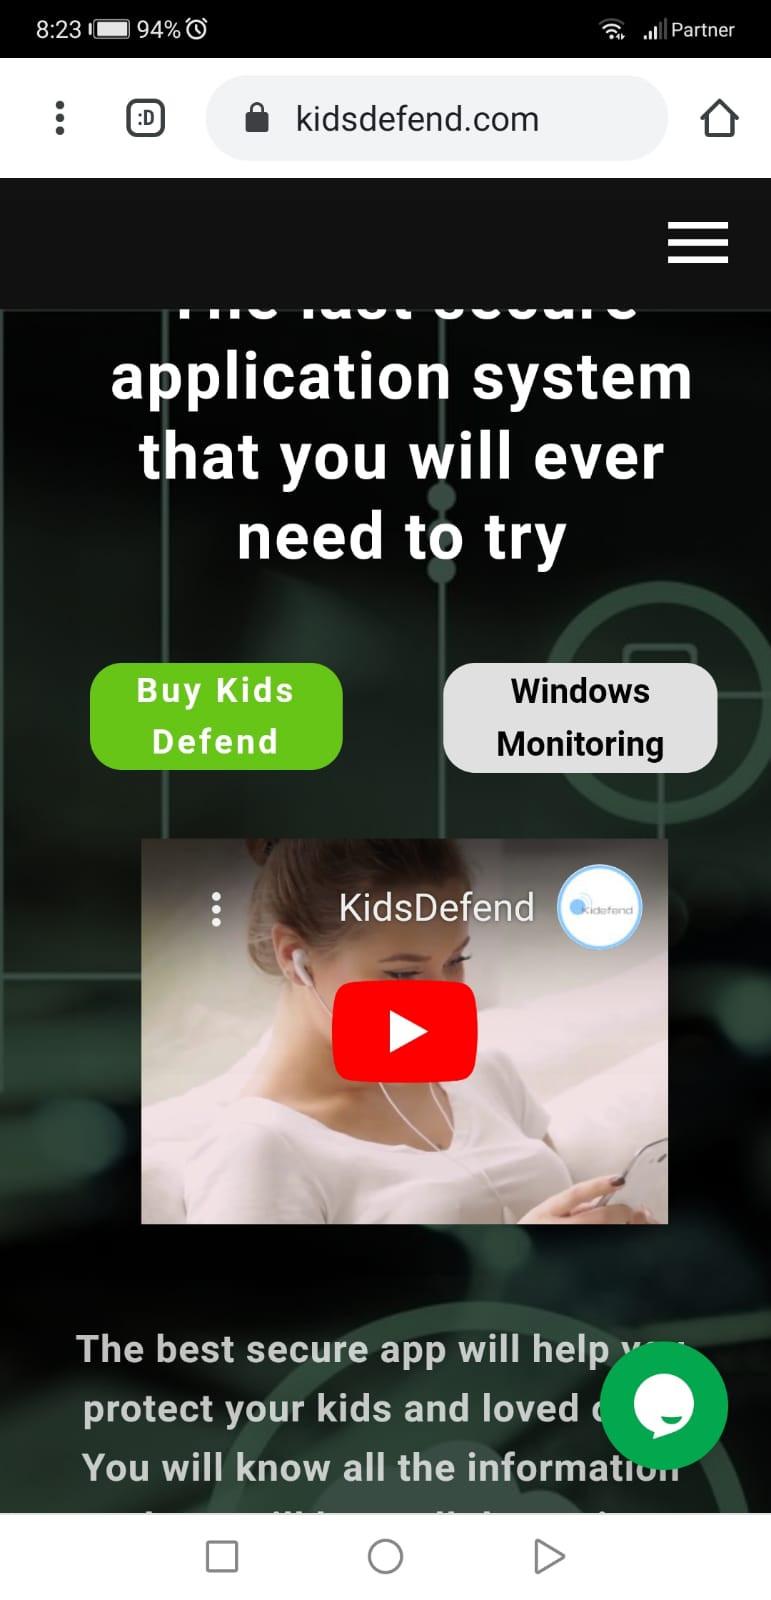 https://www.kidsdefend.com/